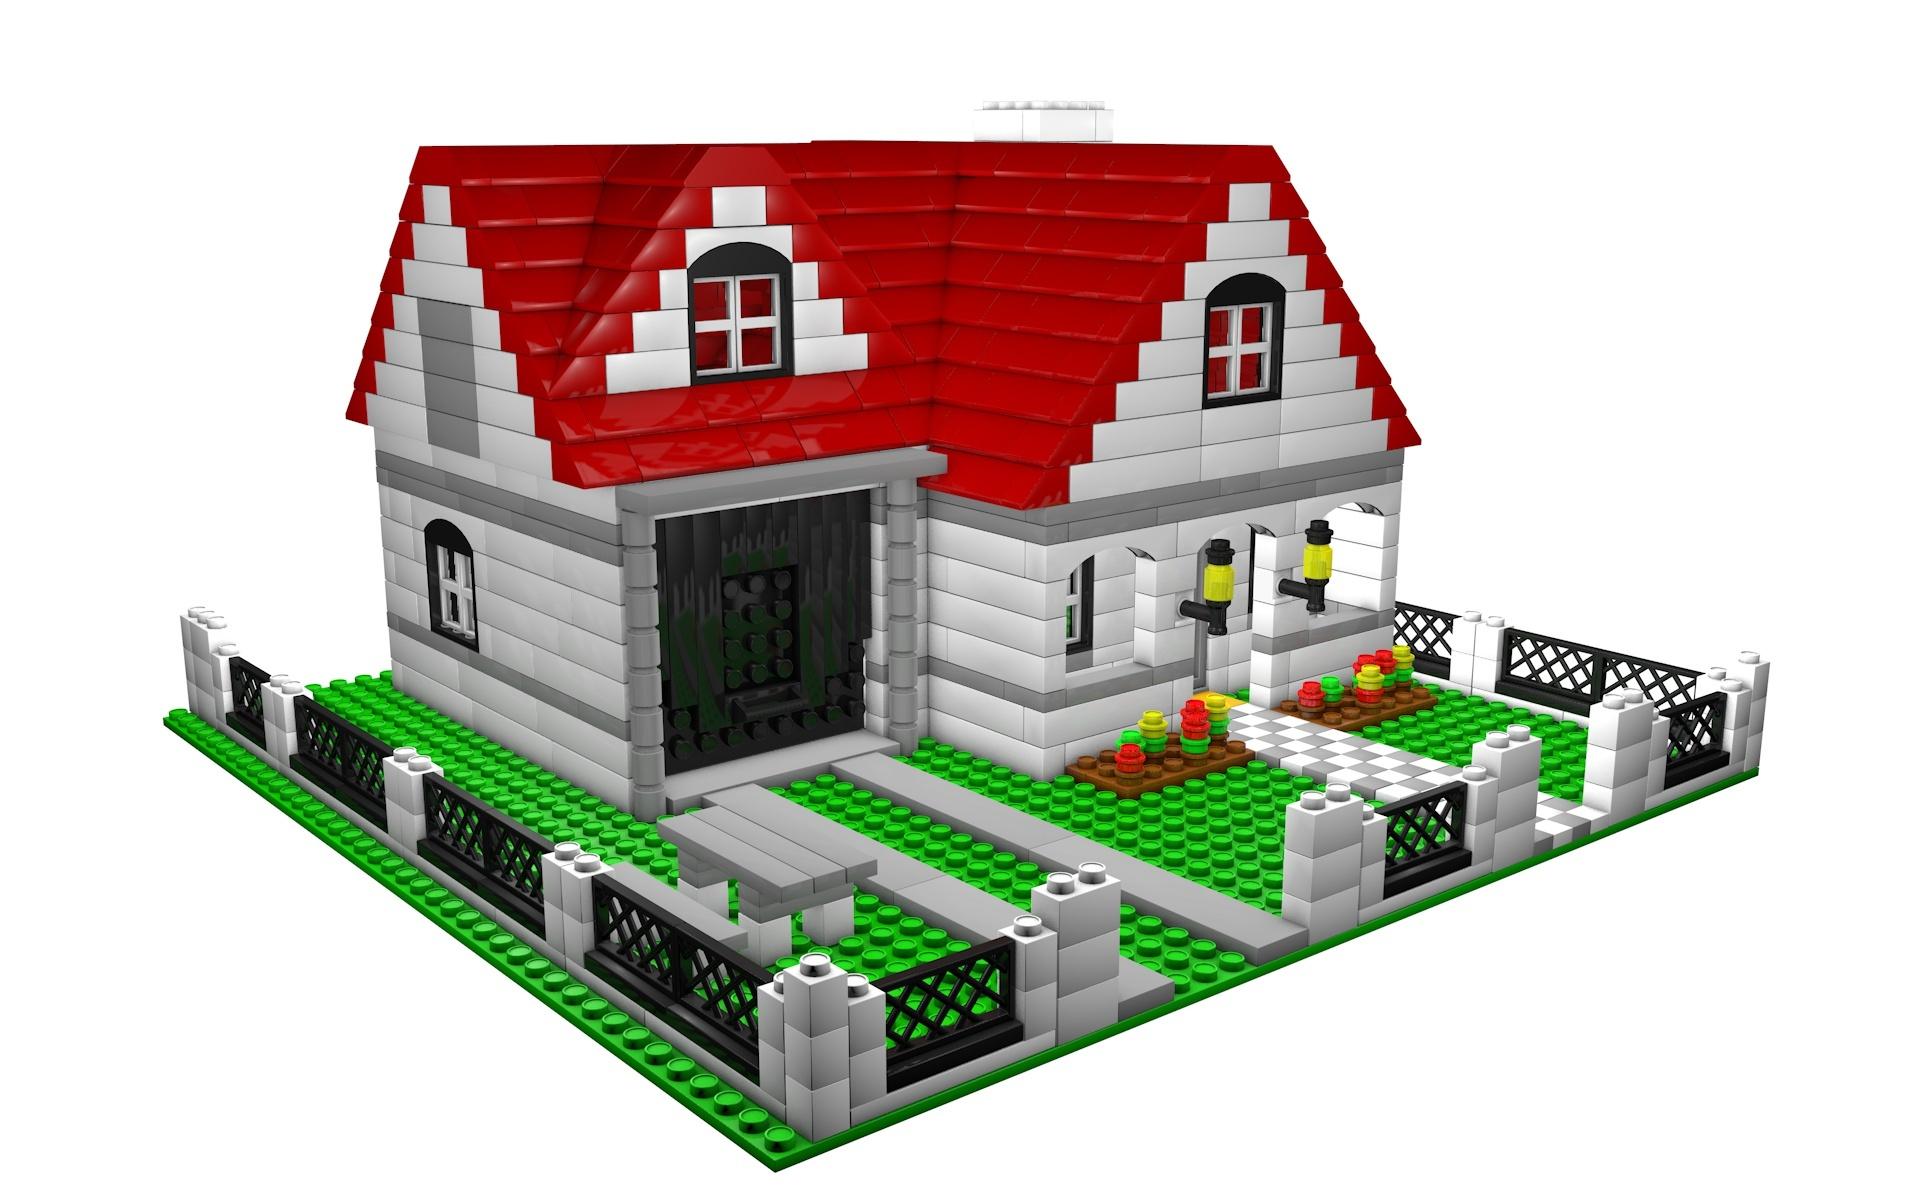 Lego house by Vladim00719 | 3DOcean